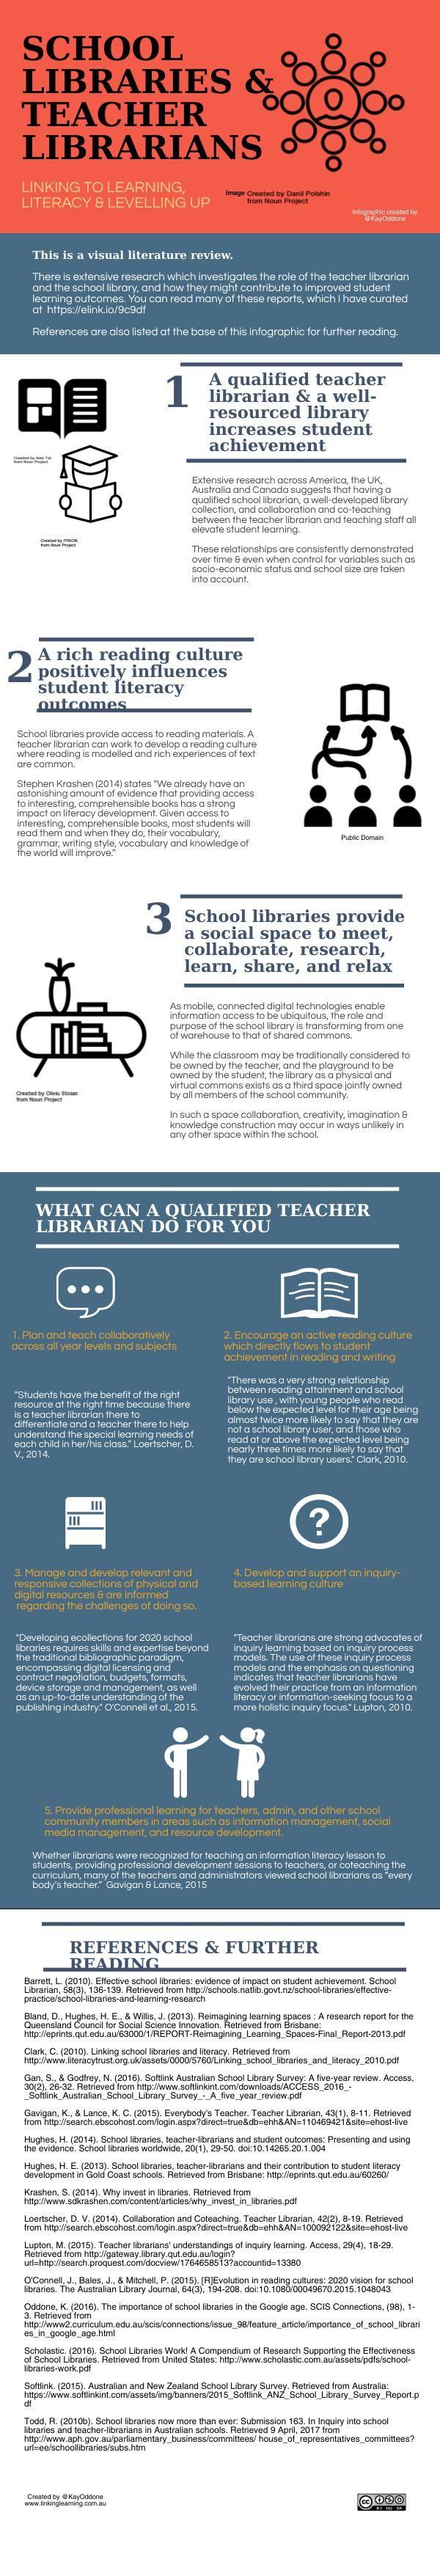 School Libraries, Teacher Librarians & Student Achievement | Piktochart Infographic Editor